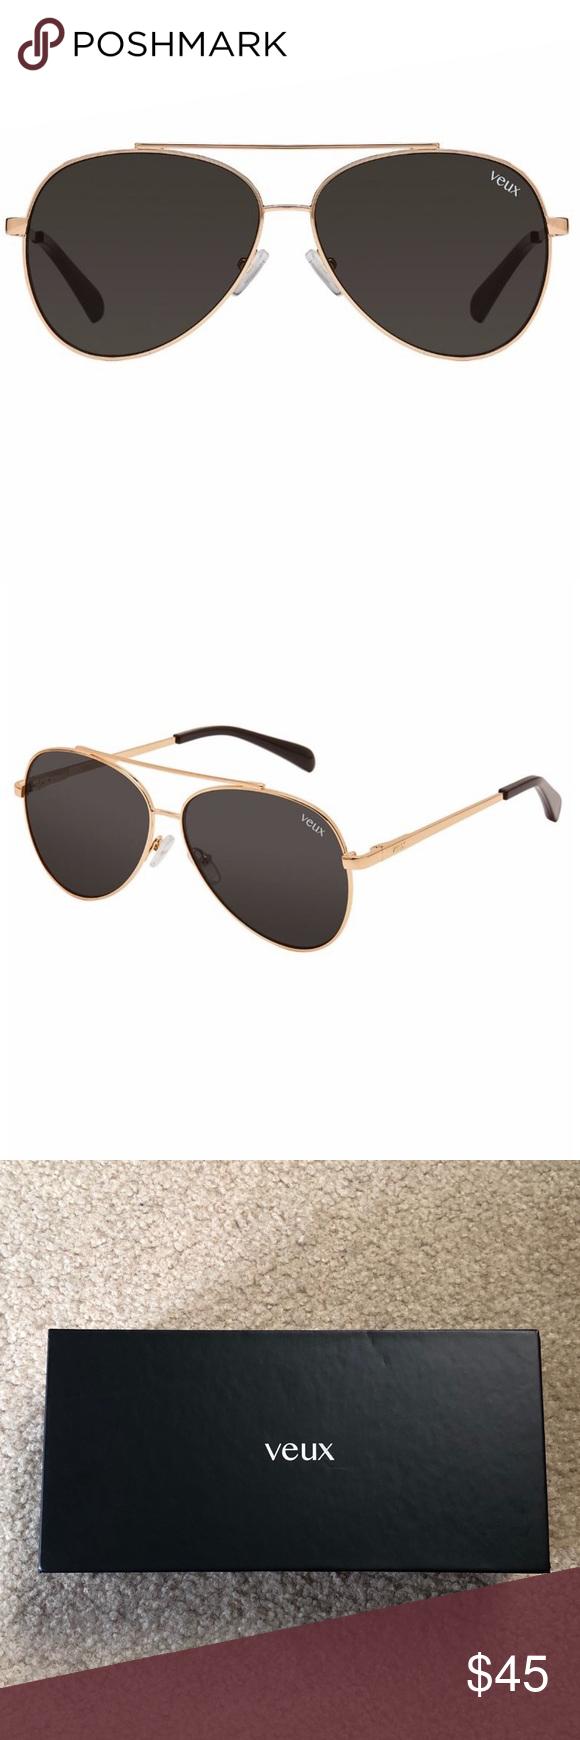 042e56dca7b •Veux sunglasses• Never before worn Brand new Quay Australia Accessories  Sunglasses